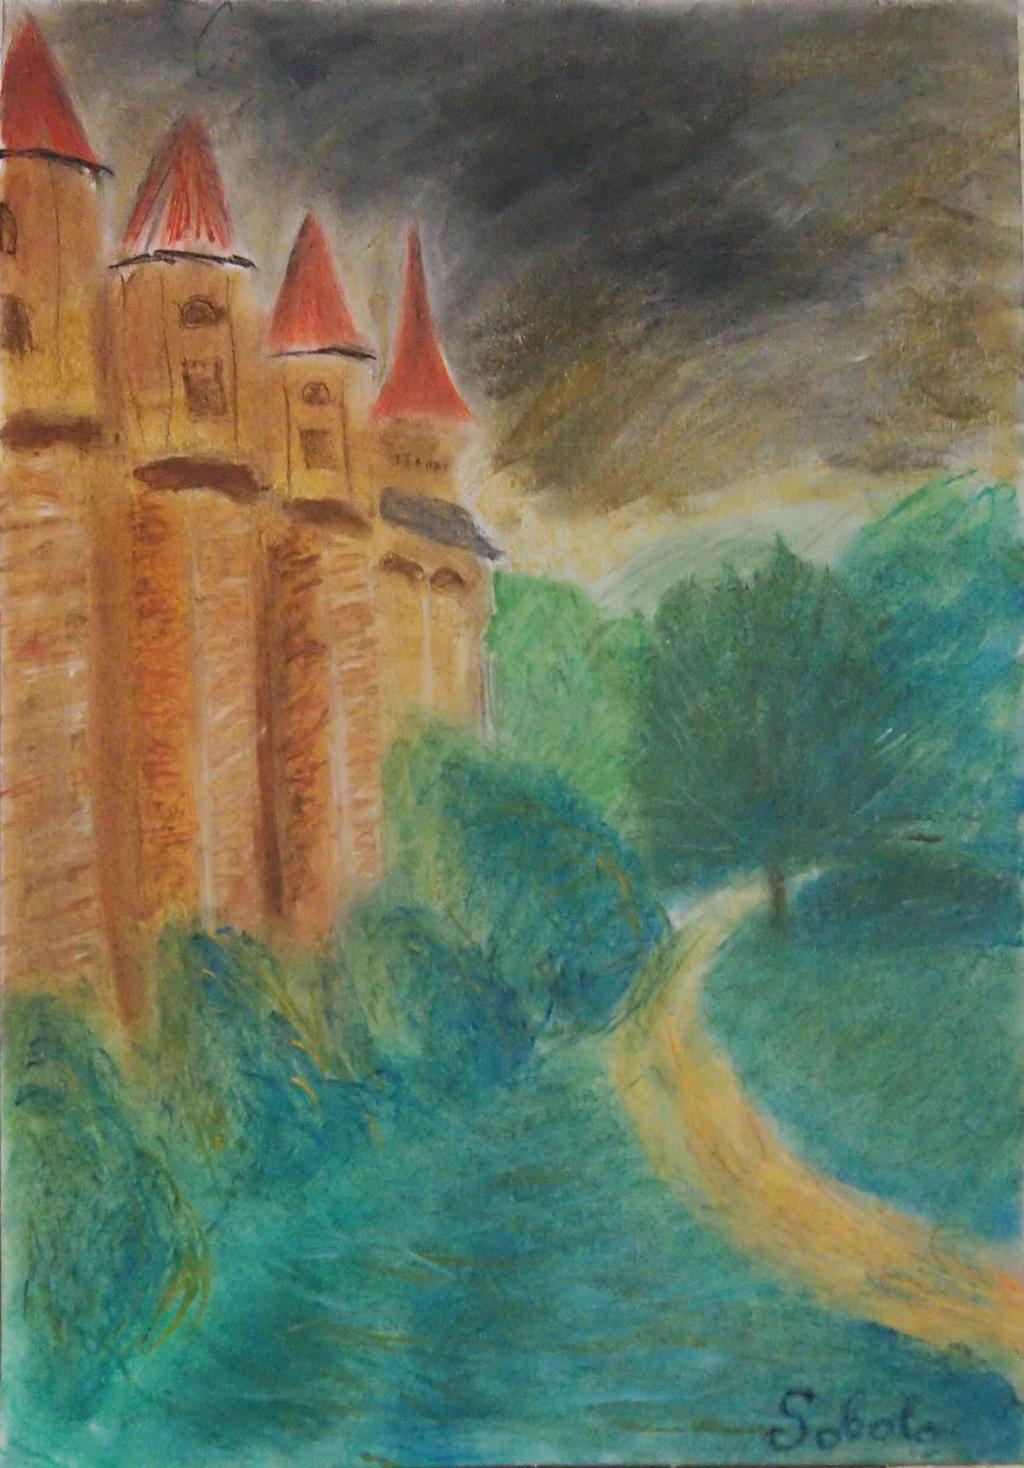 Castelul Huniazilor in Transylvania, Romania by Sobola